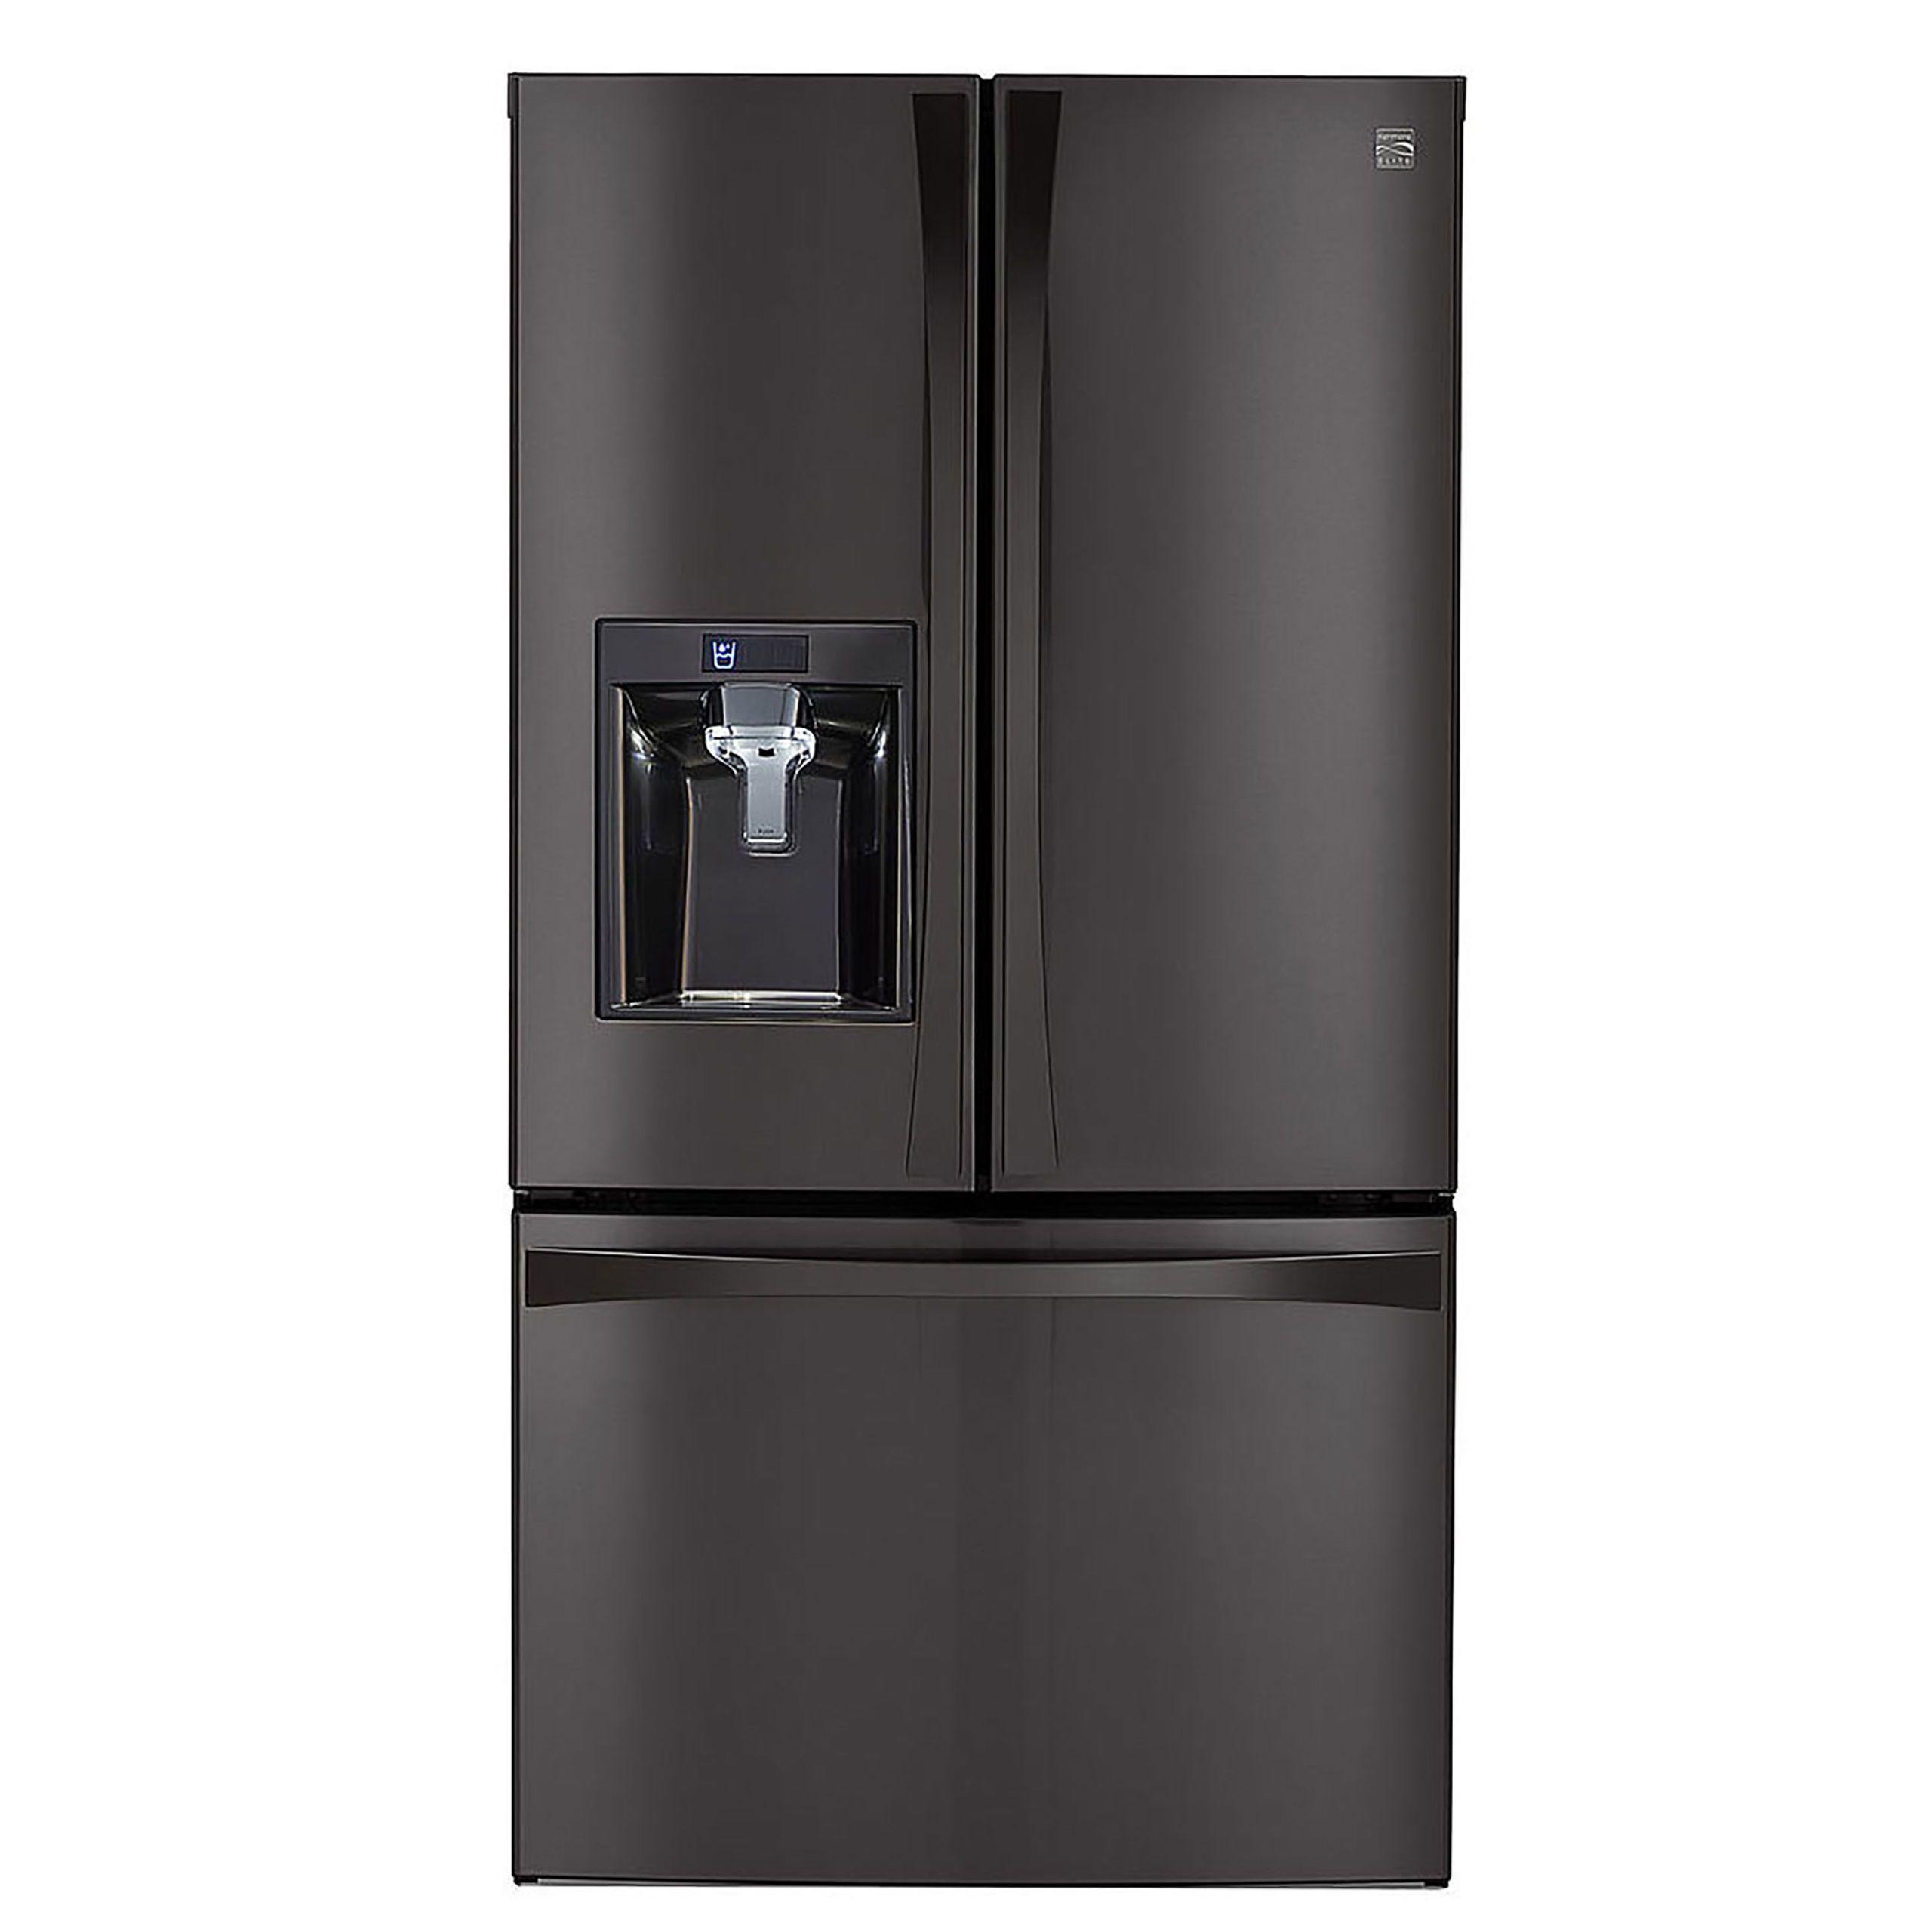 Exceptionnel Kenmore Elite 29.8 Cu. Ft. French Door Bottom Freezer Refrigerator 74027